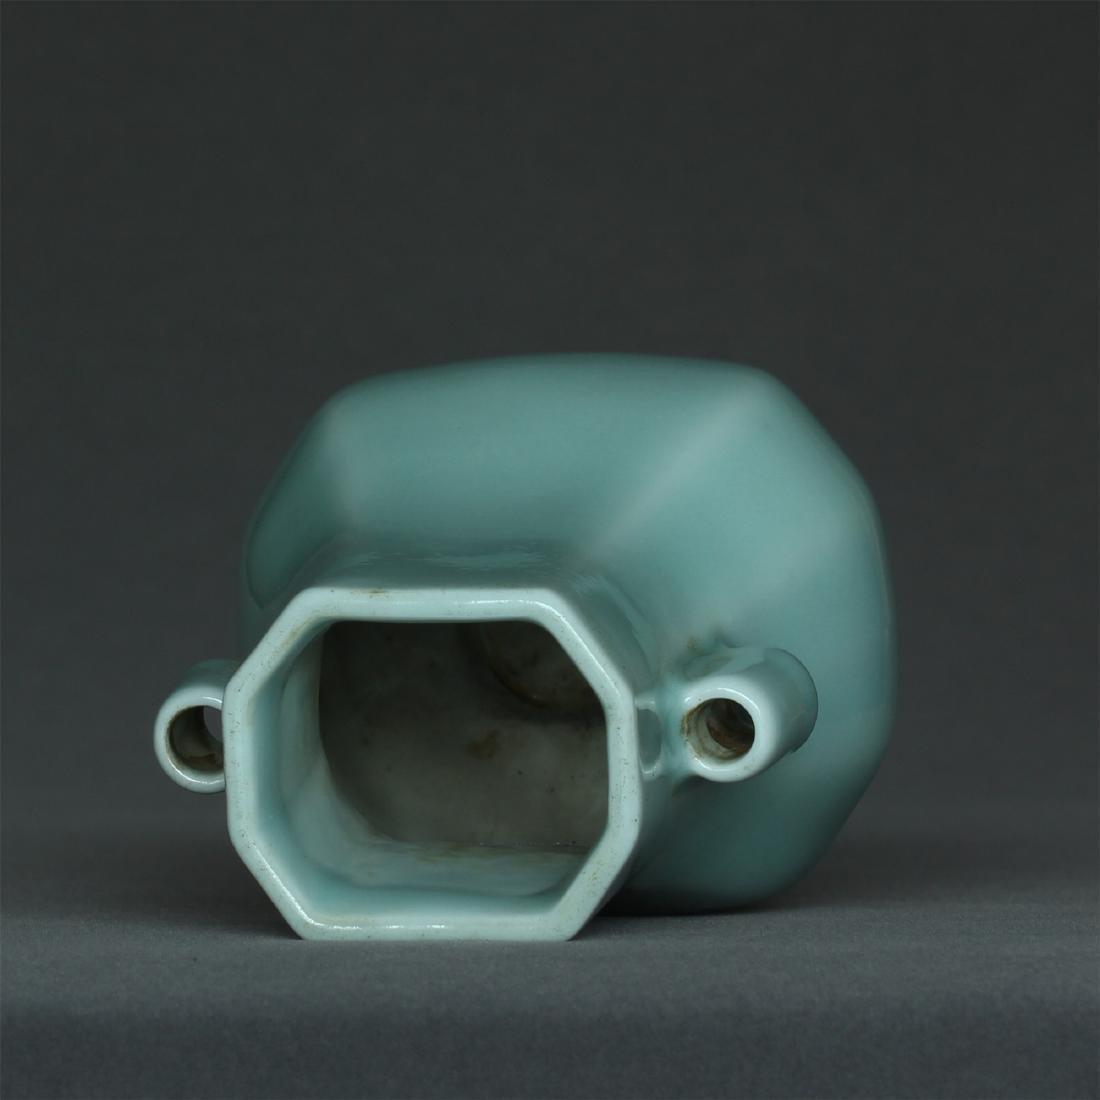 Blue glaze porcelain vase of Qing Dynasty QianLong - 9